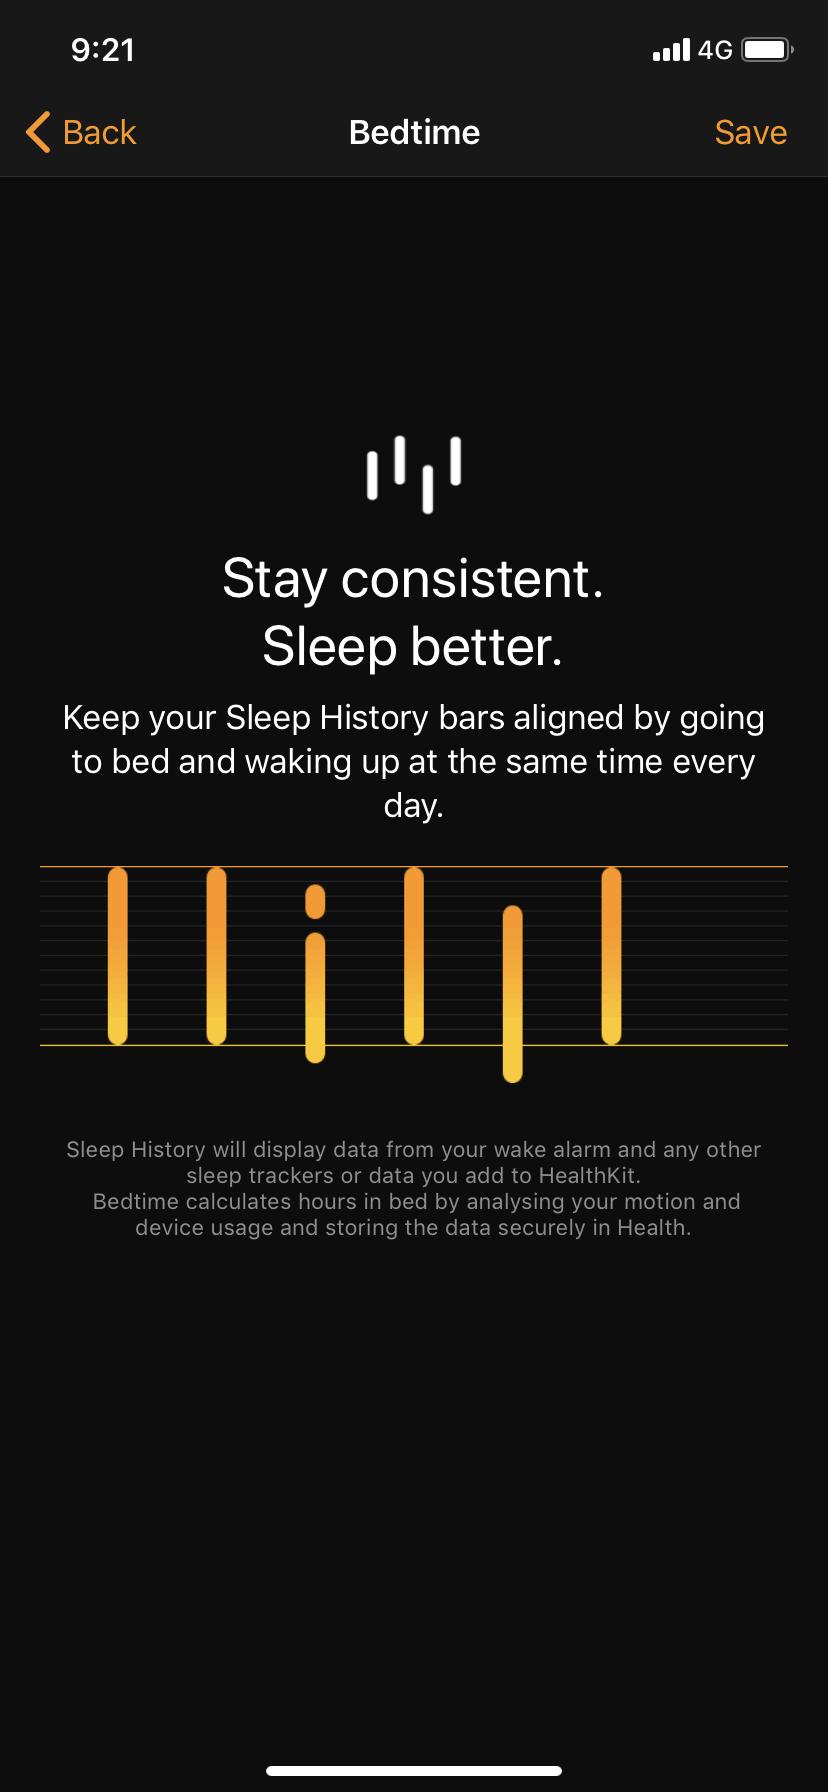 Sleep History on iOS by Apple Alarm from UIGarage